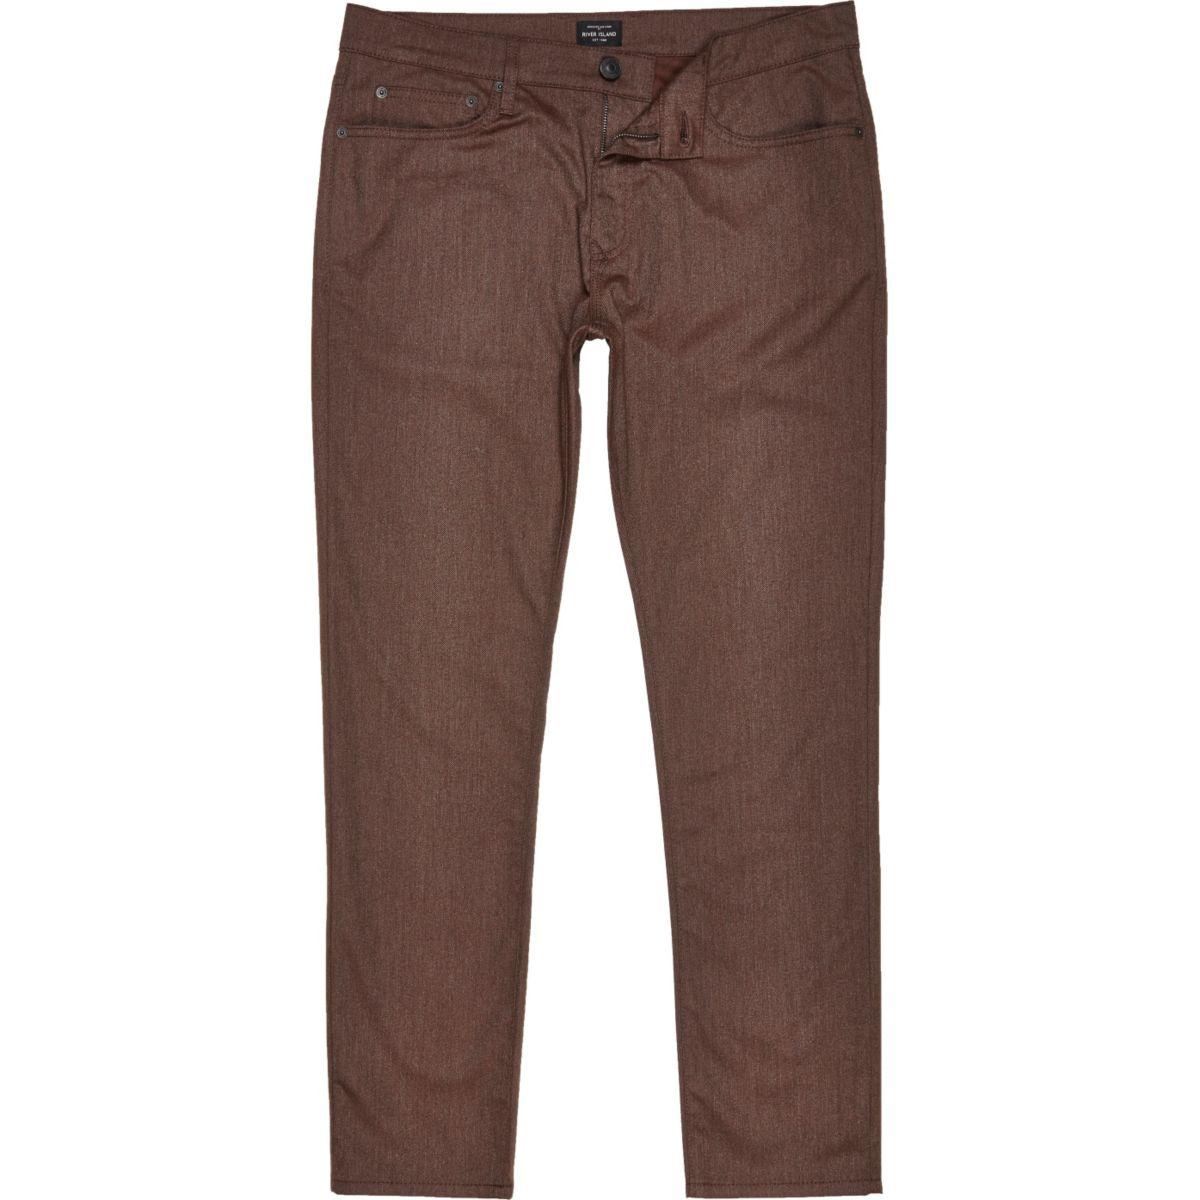 Brown five pocket slim fit trousers